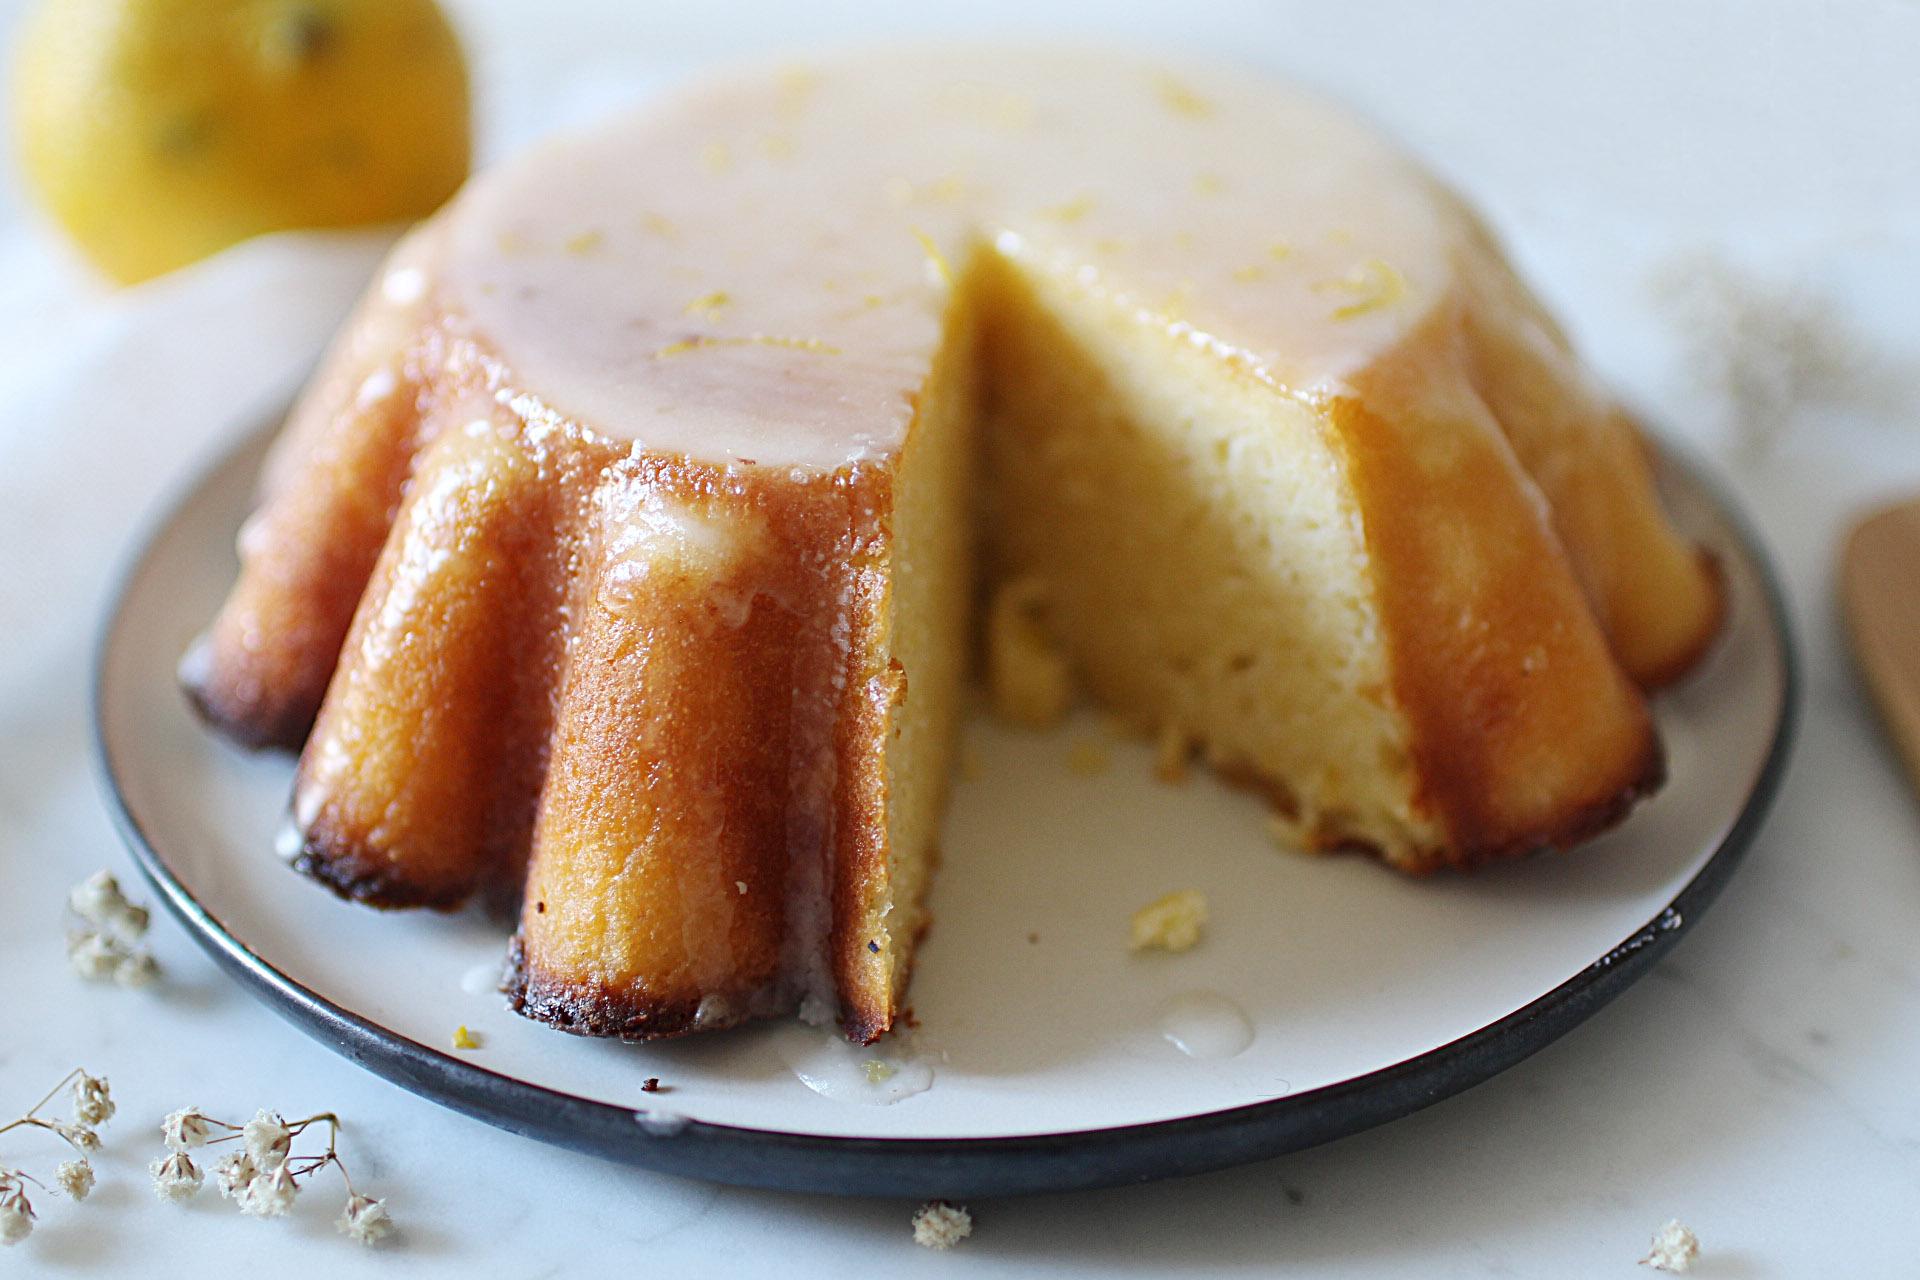 gateau_recette_polenta_bergamote